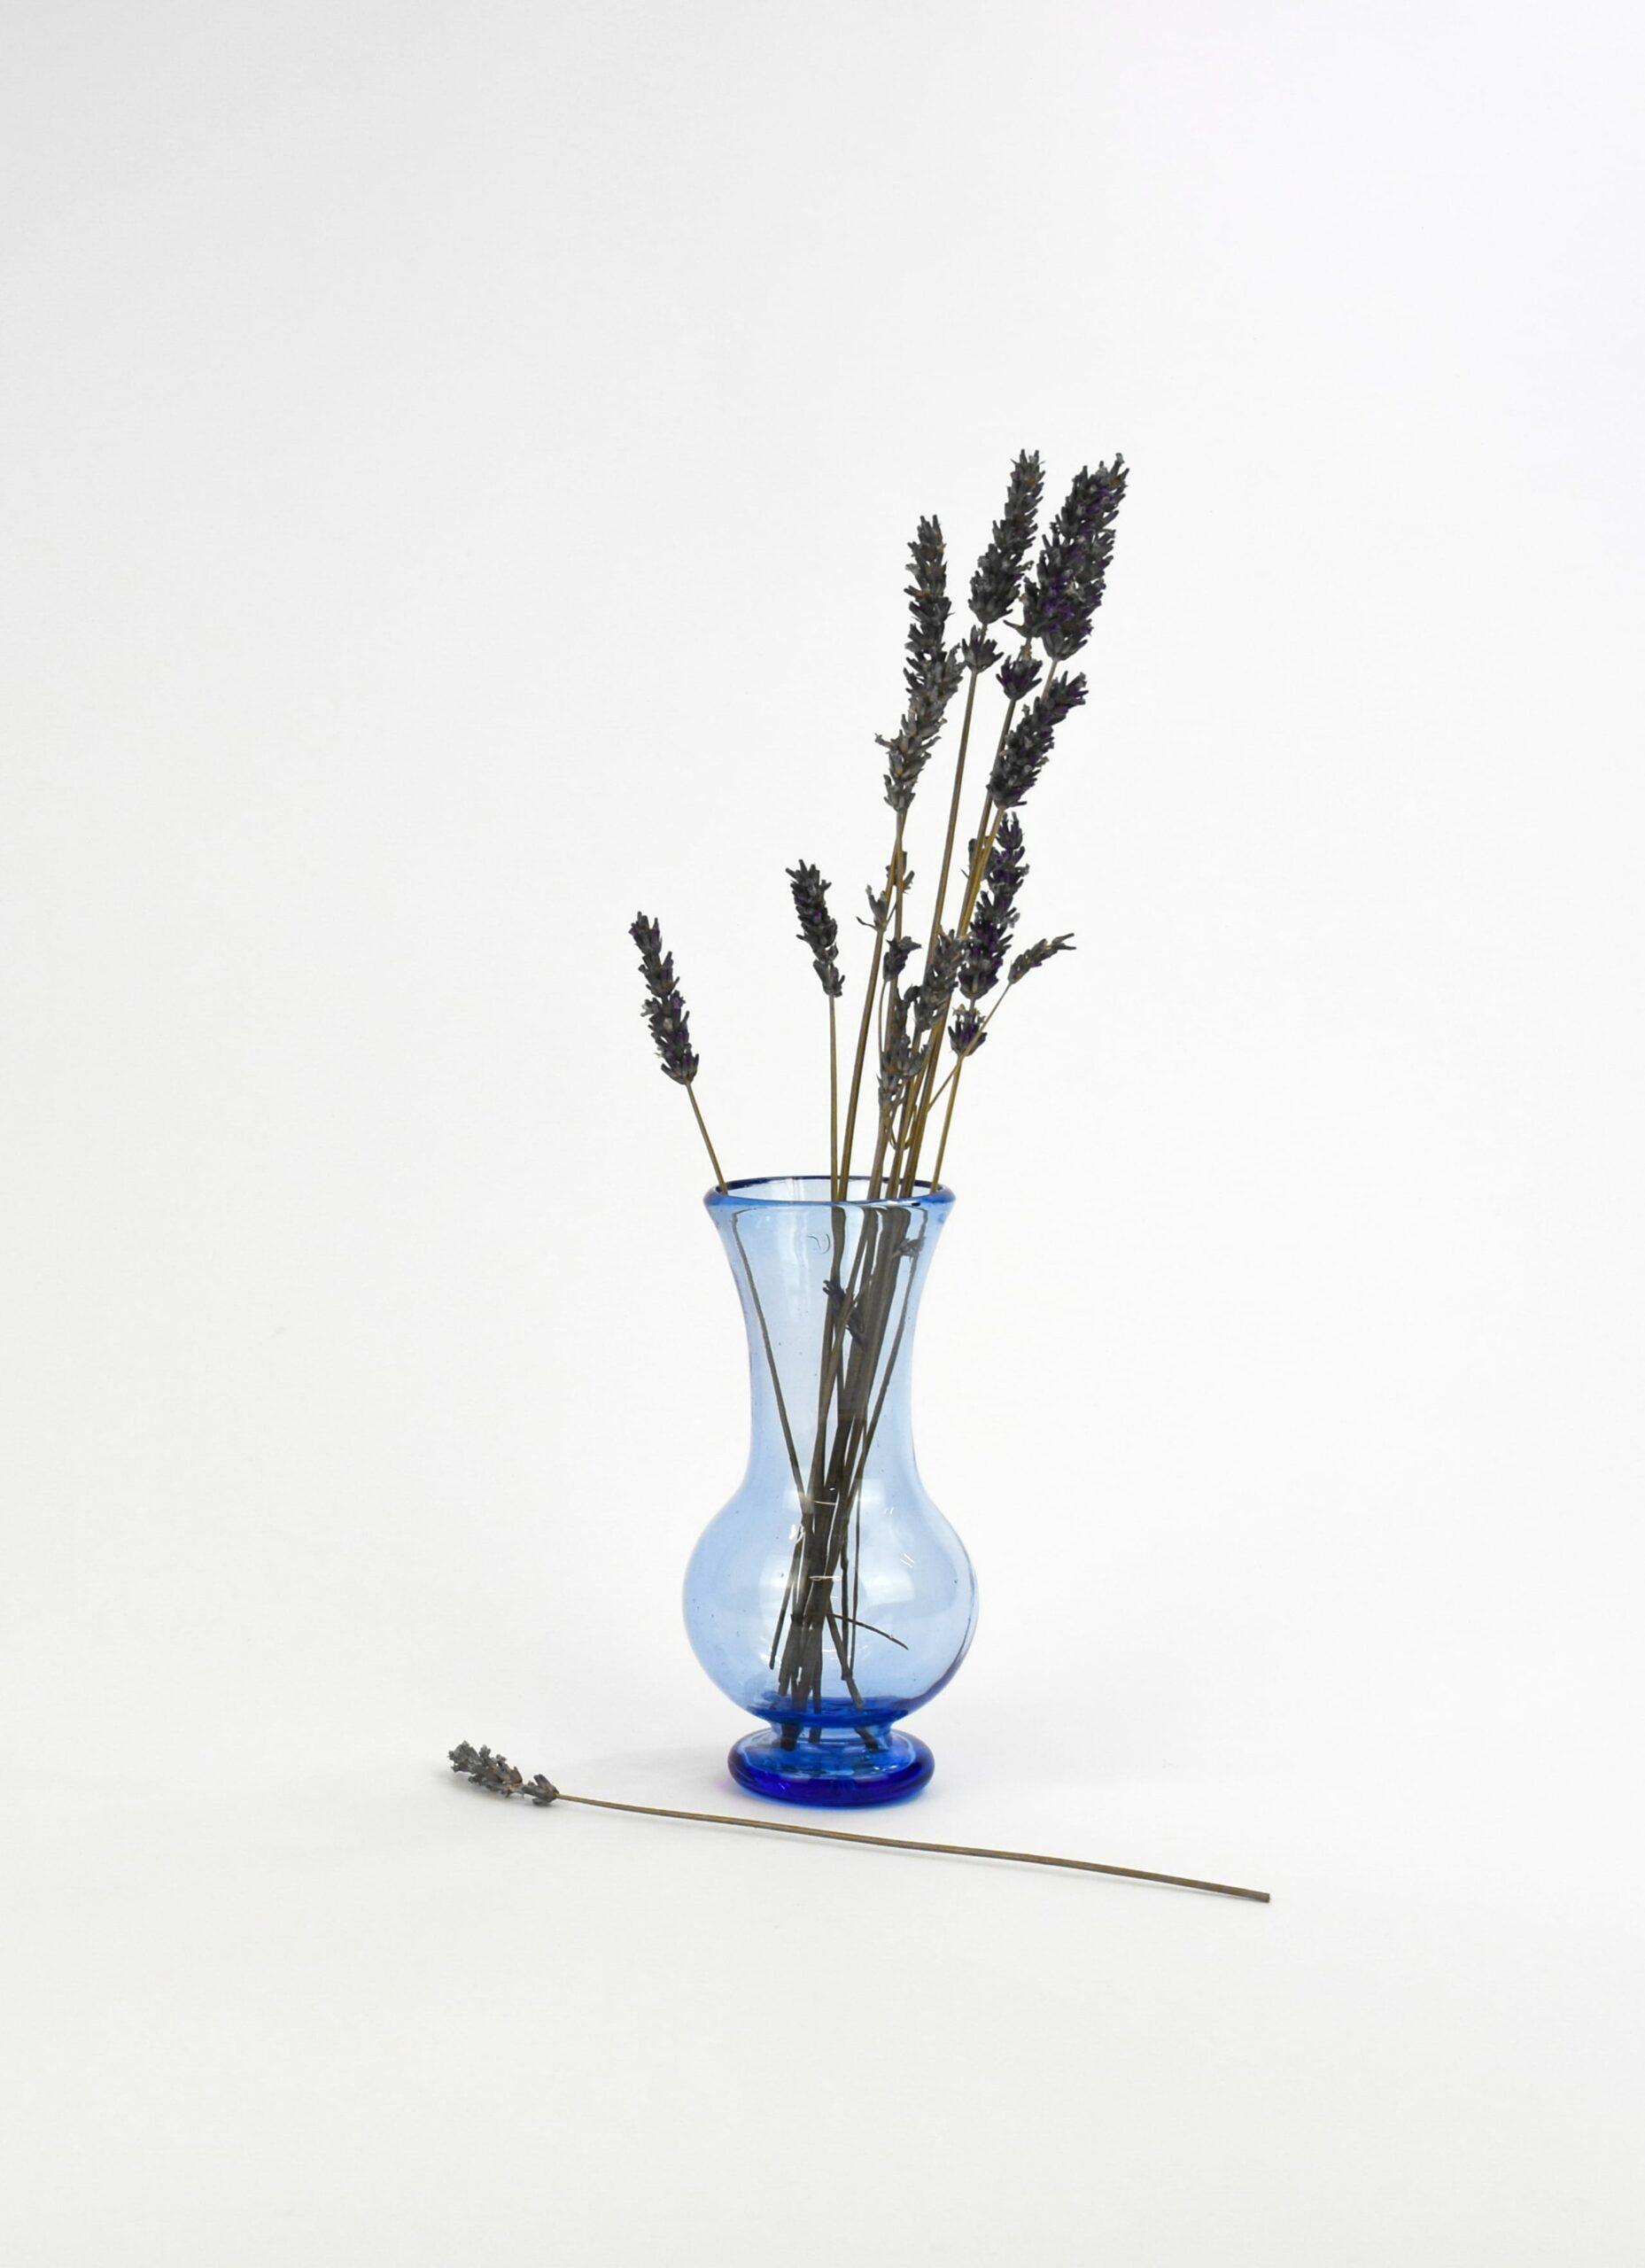 La Soufflerie - Silhouette - Glass Carafe - Light Blue